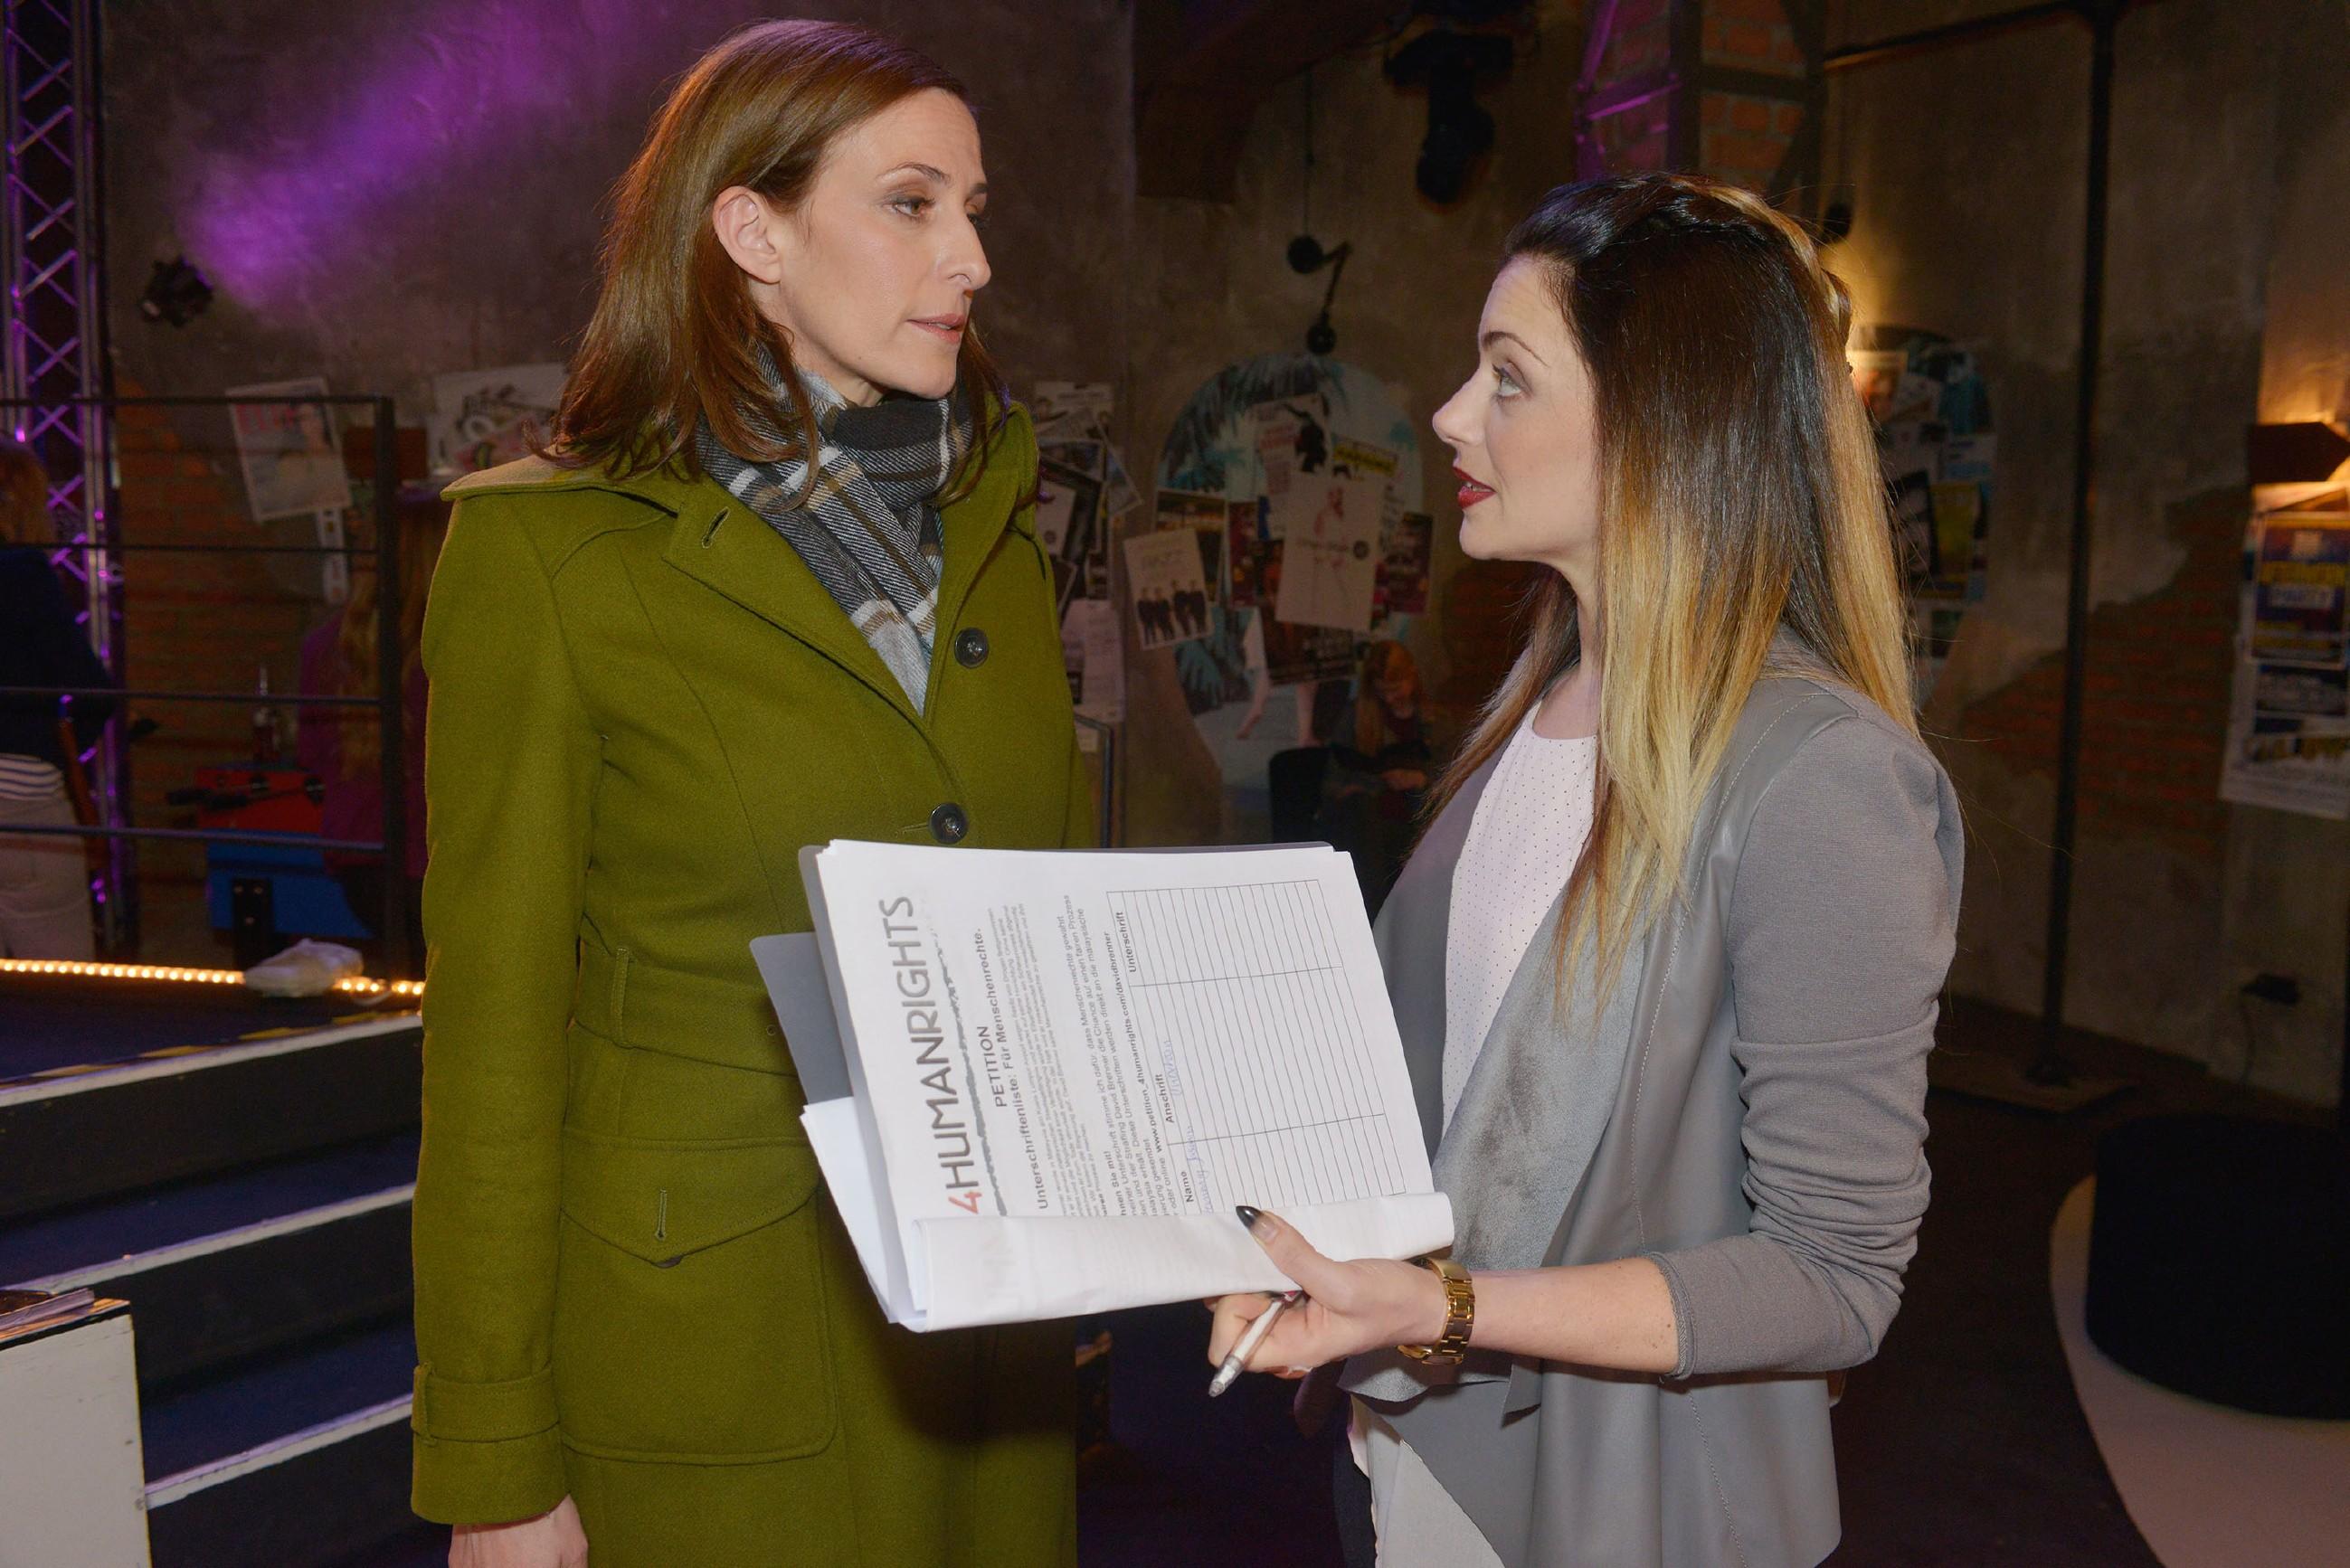 Katrin (Ulrike Frank, l.) findet Emilys (Anne Menden) Aktionismus für David völlig unsinnig. (Quelle: RTL / Rolf Baumgartner)